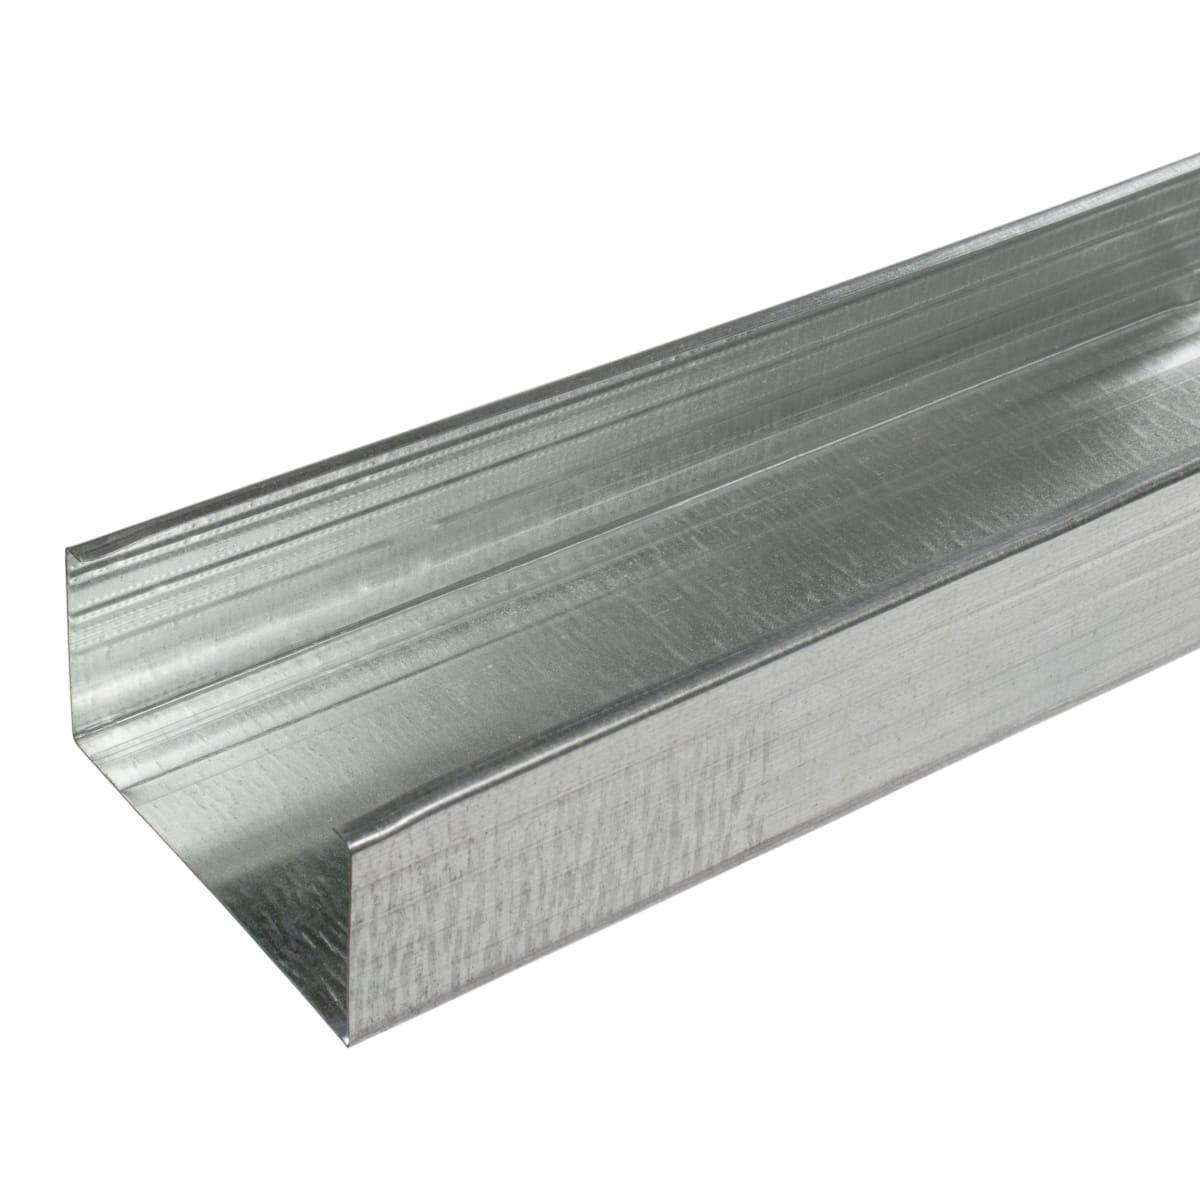 Профиль ПС (100\50) L3,0 м (0.4 мм)